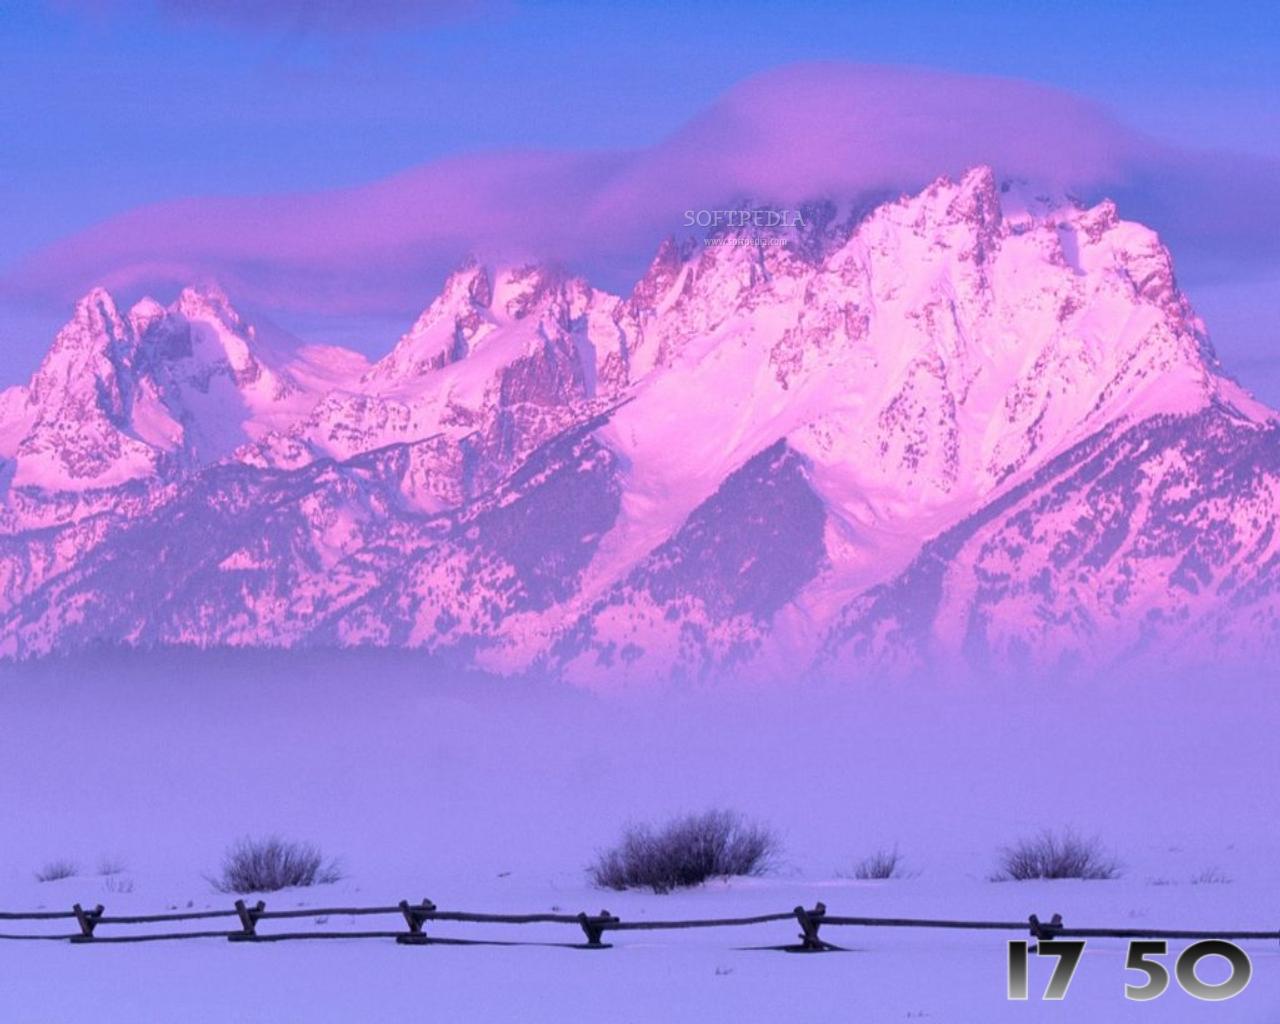 Image Source Page: http://www.softpedia.com/progScreenshots/Winter ...